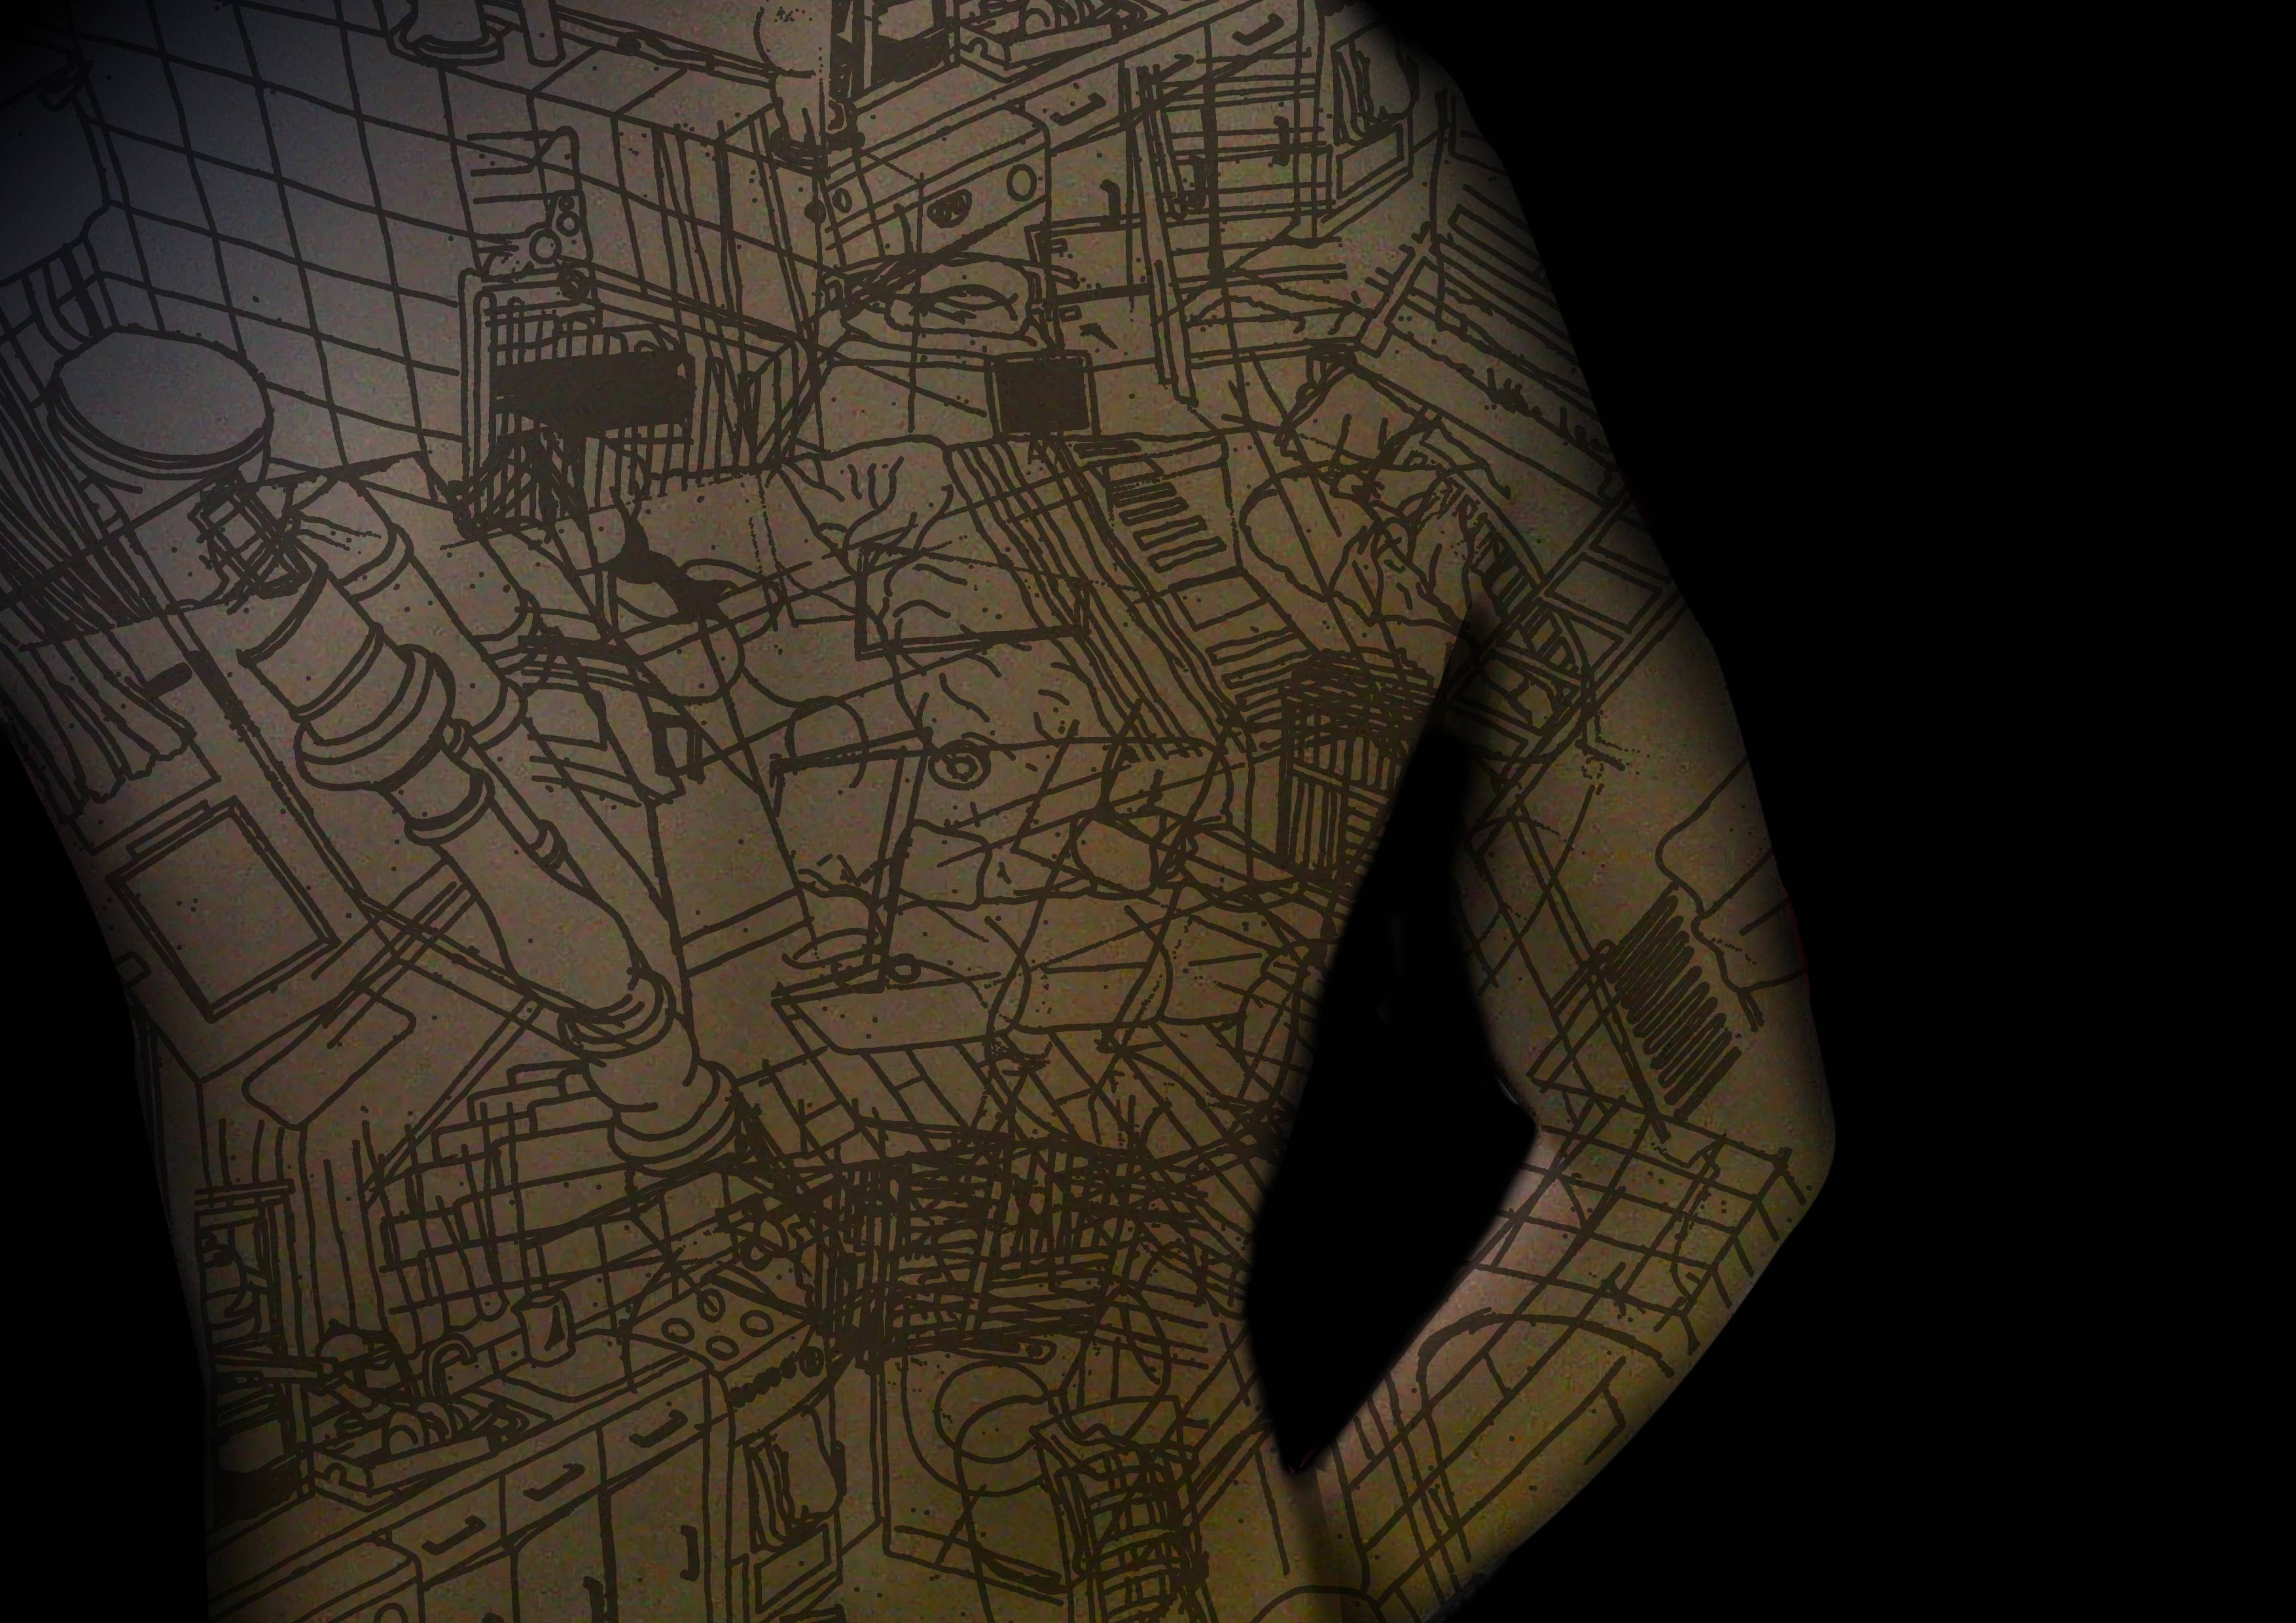 prison break tattoo wallpapers wallpaper cave. Black Bedroom Furniture Sets. Home Design Ideas